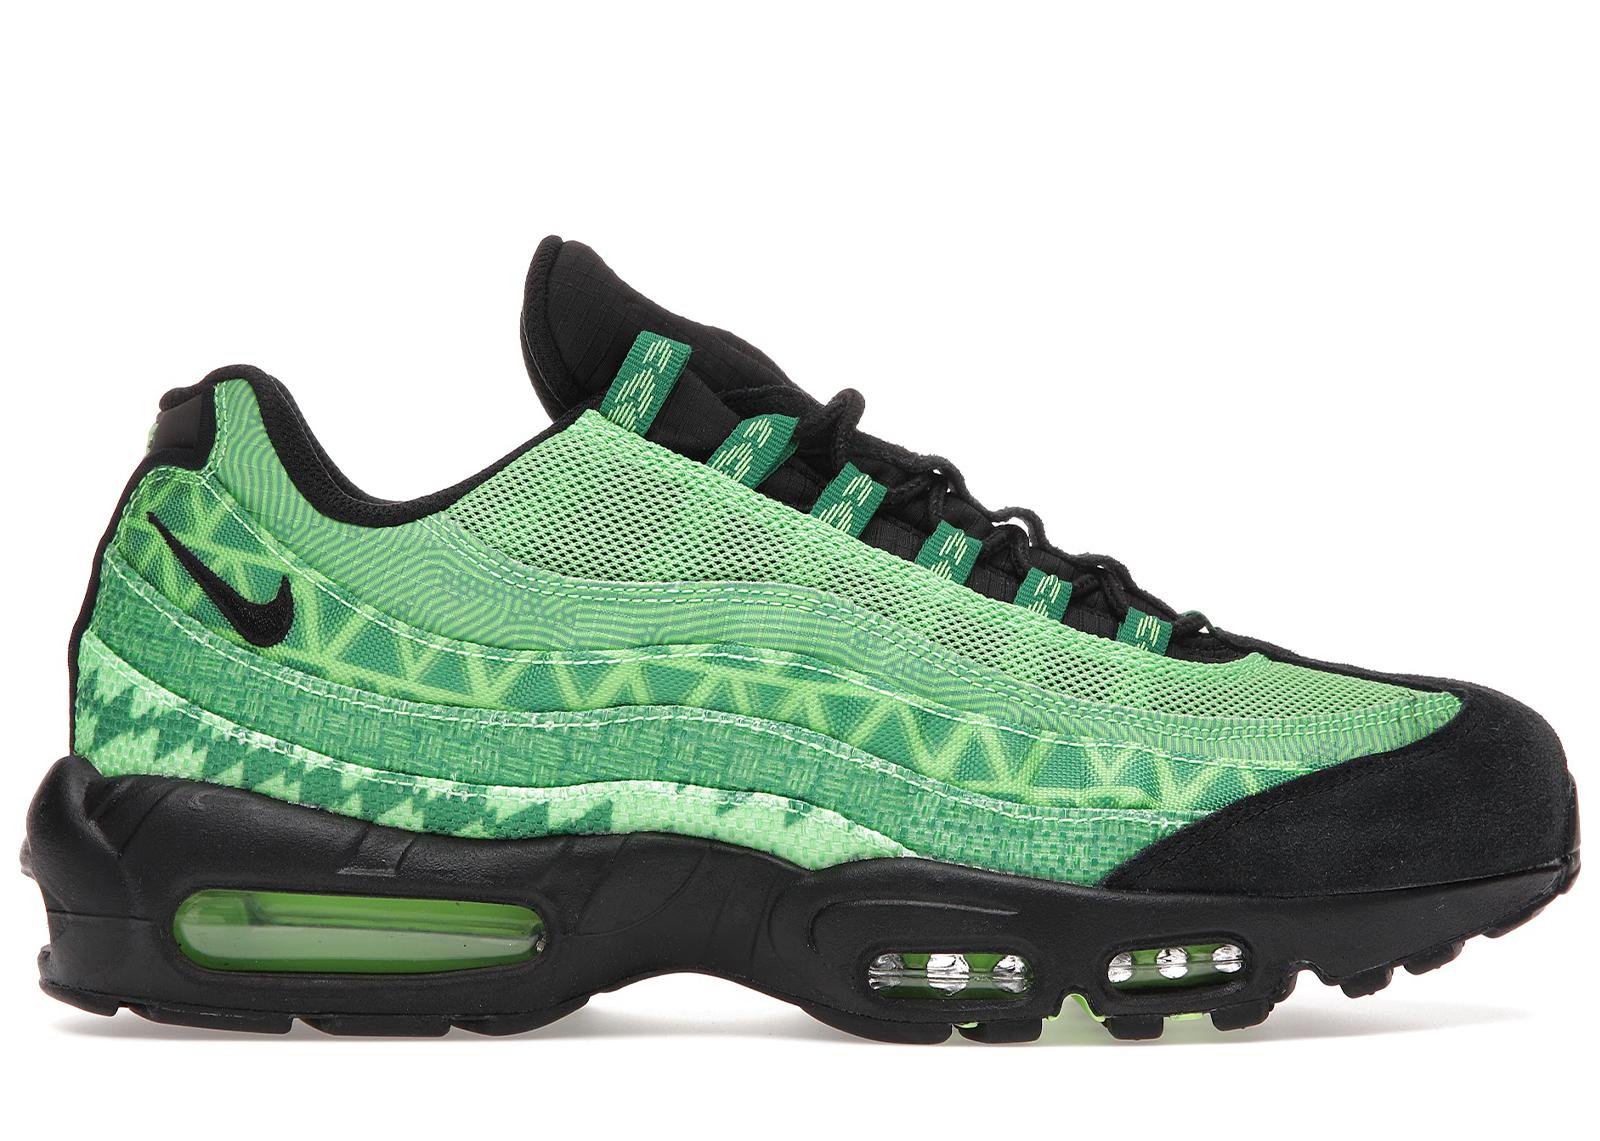 Acheter Nike Air Max 95 Chaussures et sneakers neuves